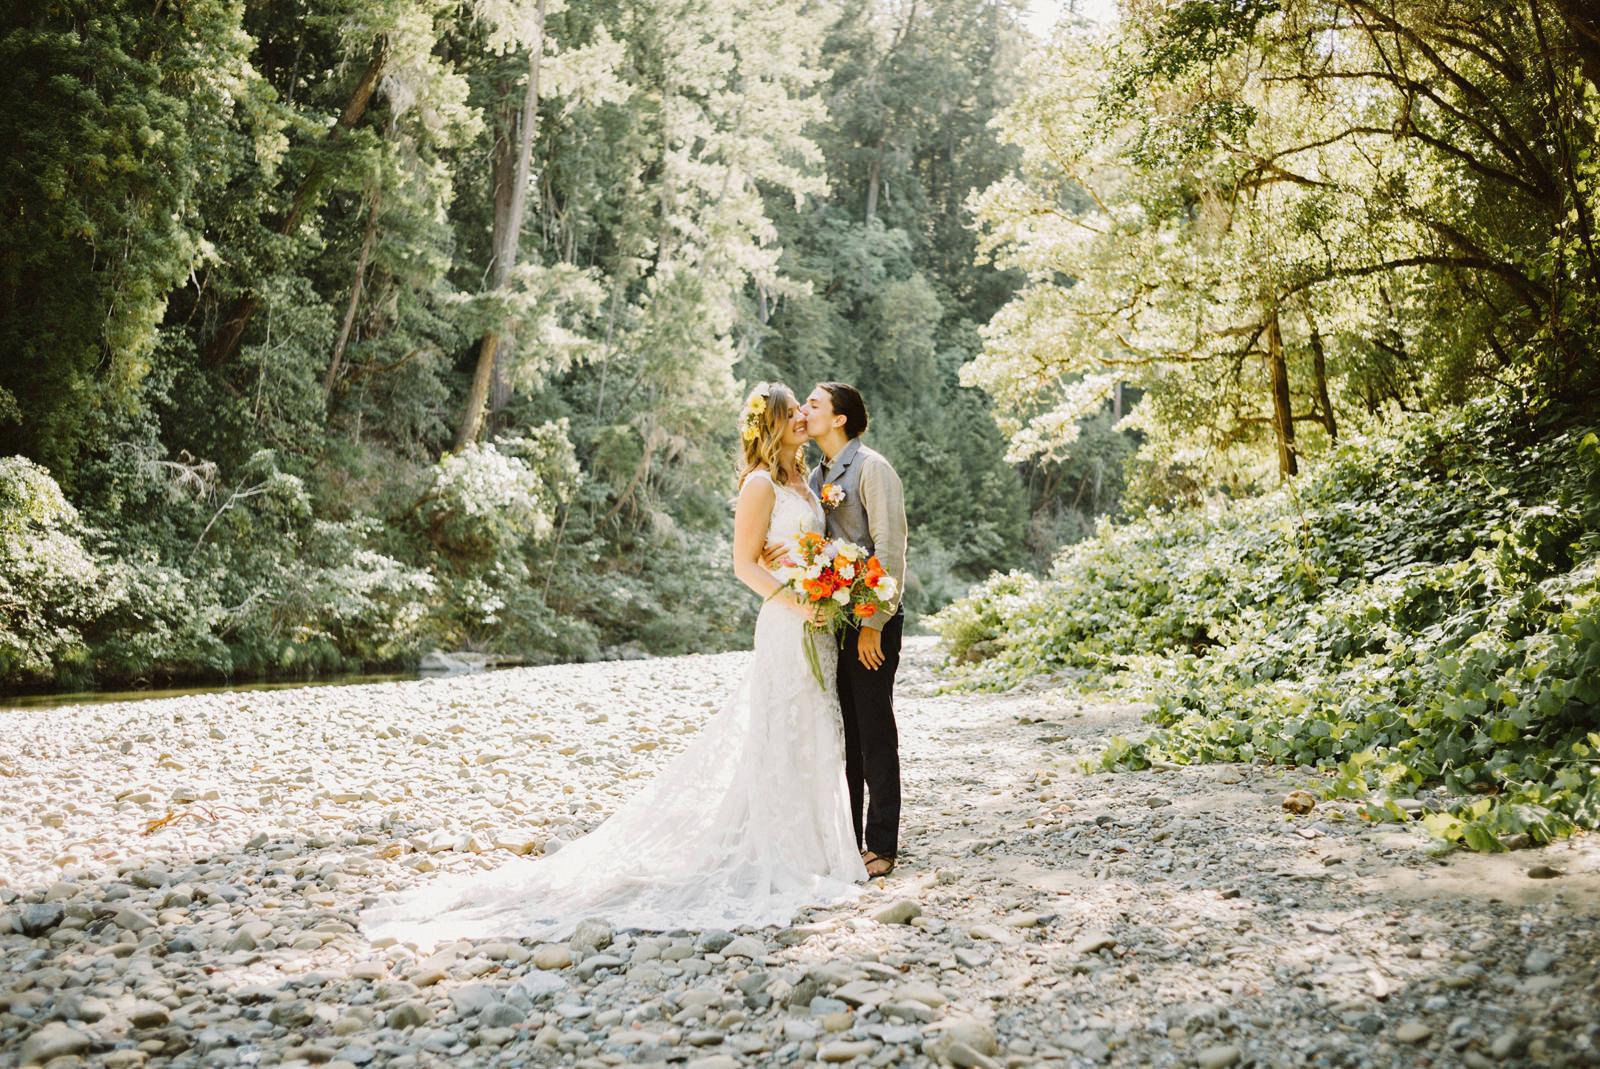 rivers-bend-retreat-wedding-052 RIVER'S BEND RETREAT WEDDING